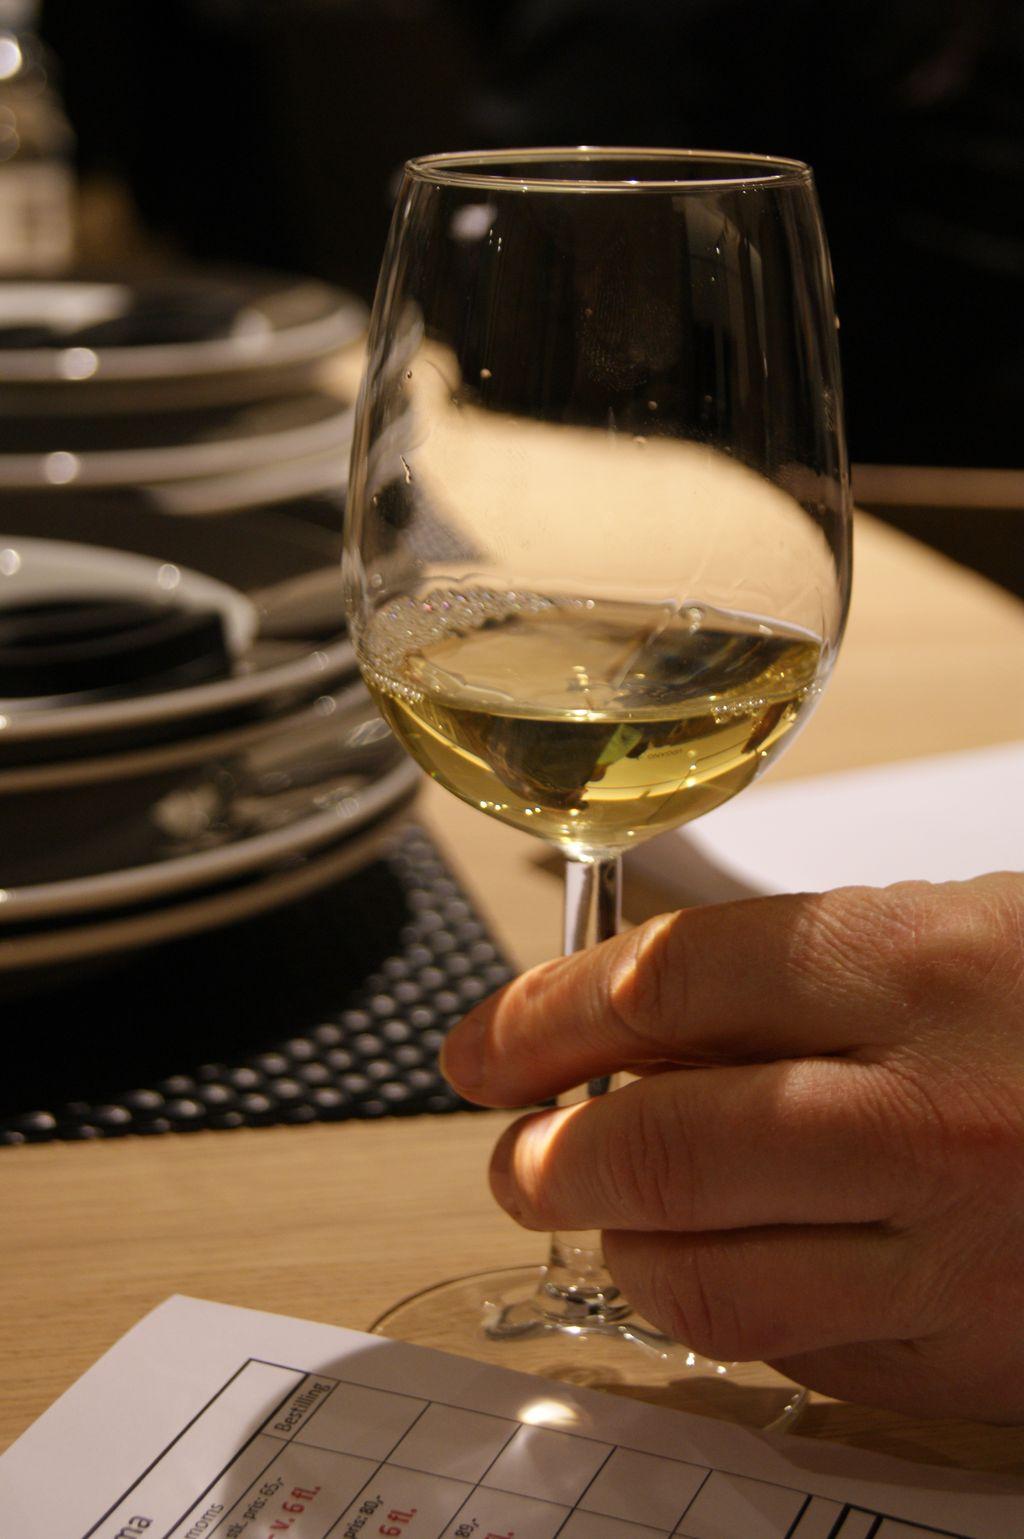 skovgaard vine næstved